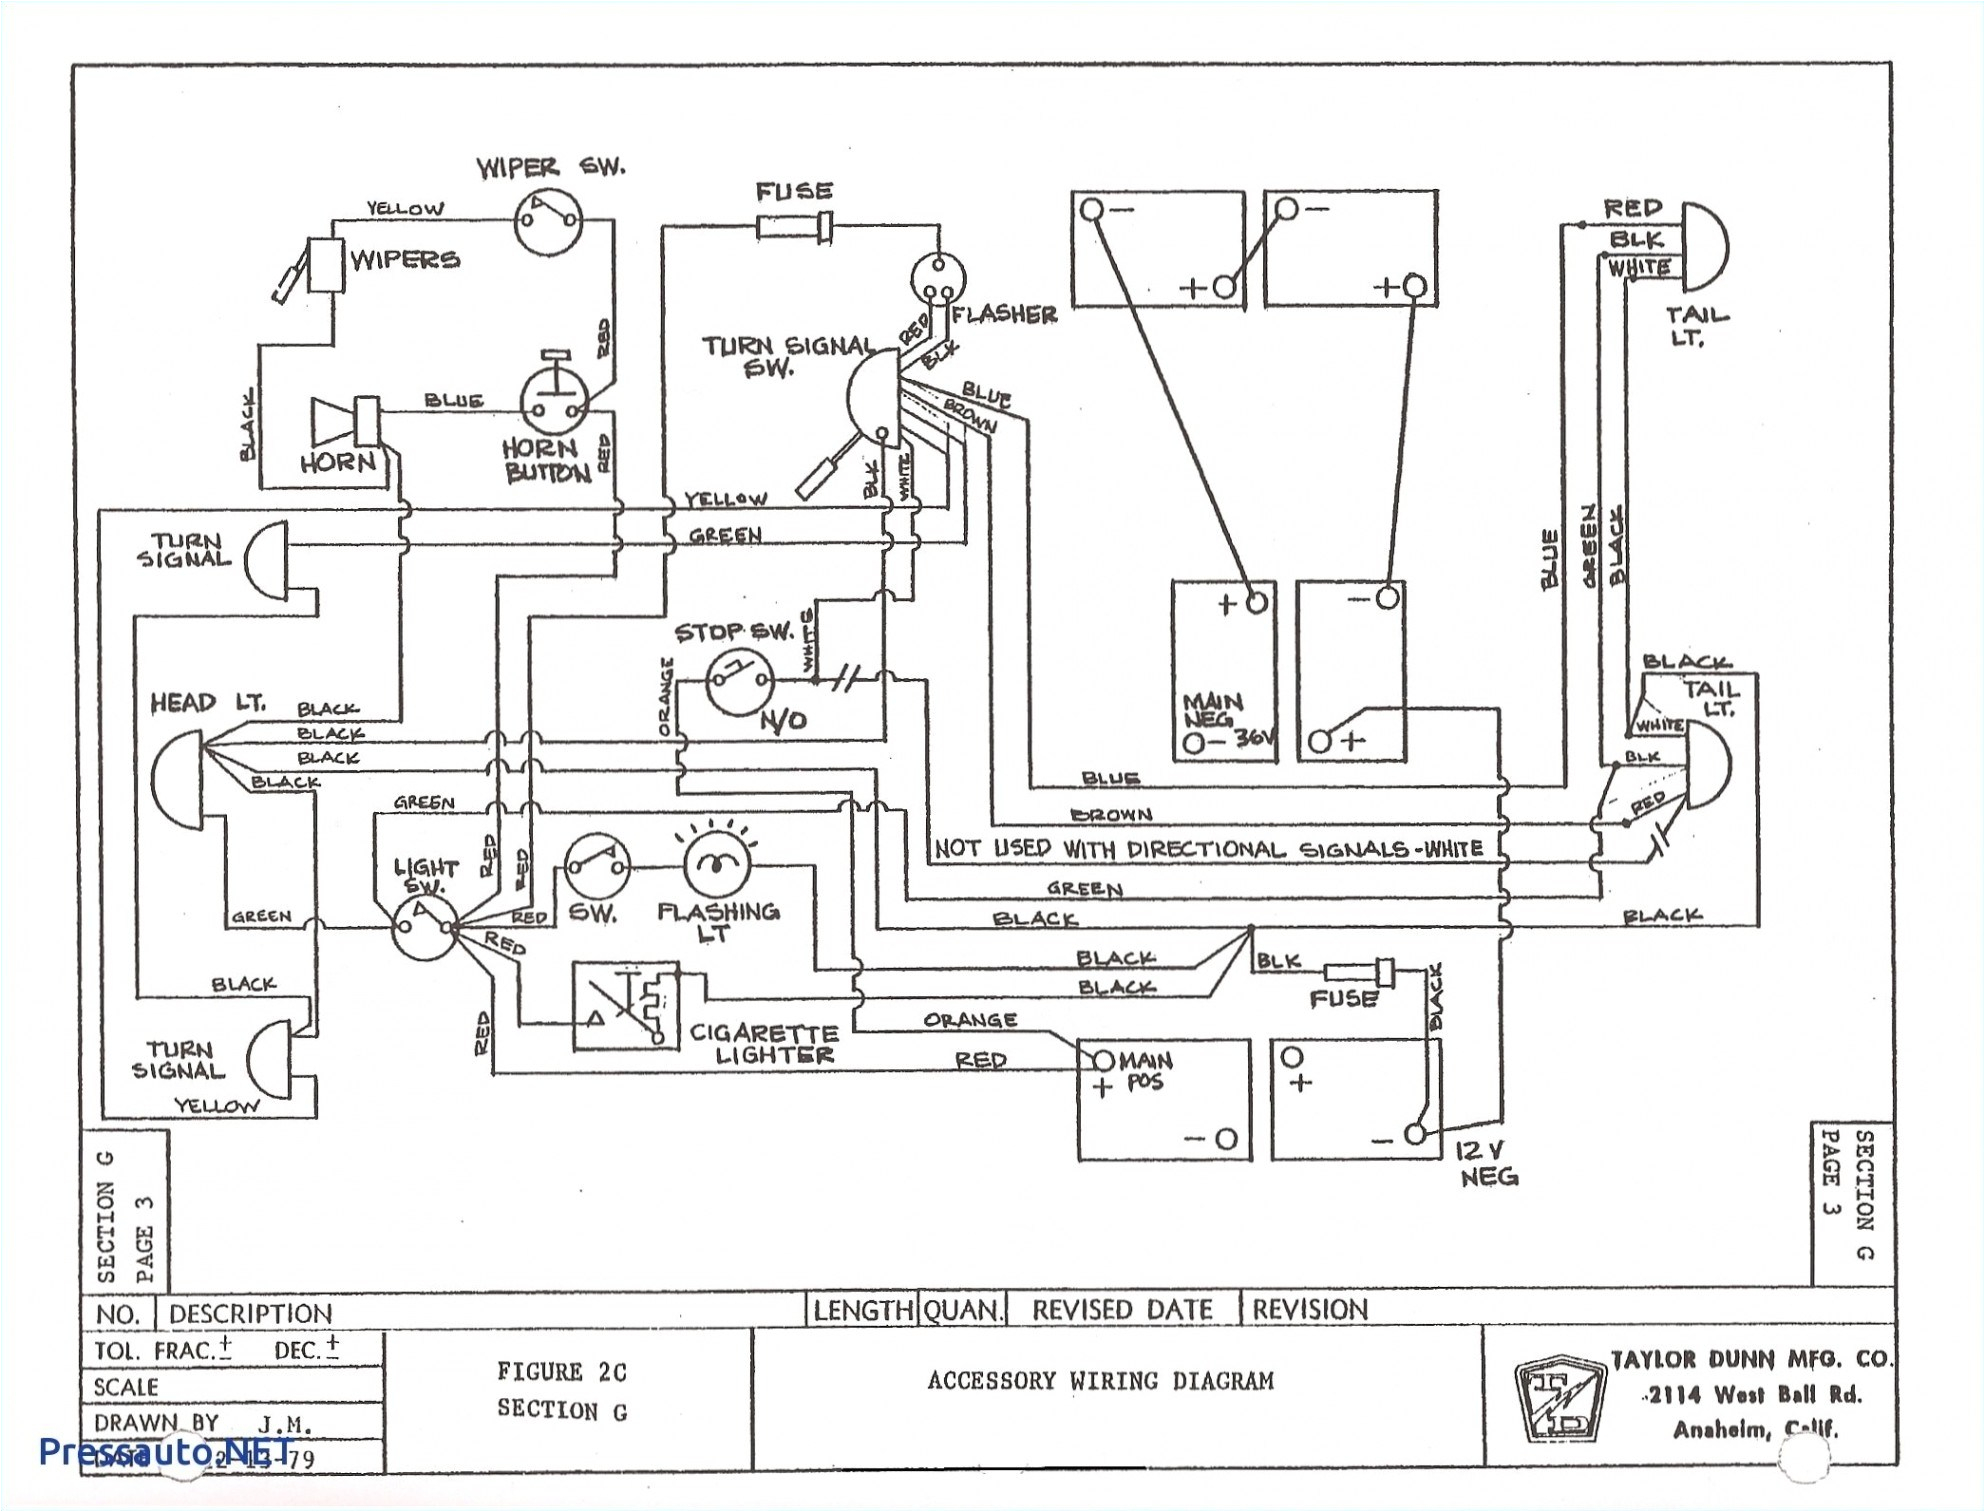 ezgo pb6 golf cart wiring diagram wiring diagram centre ezgo pb6 golf cart wiring diagram